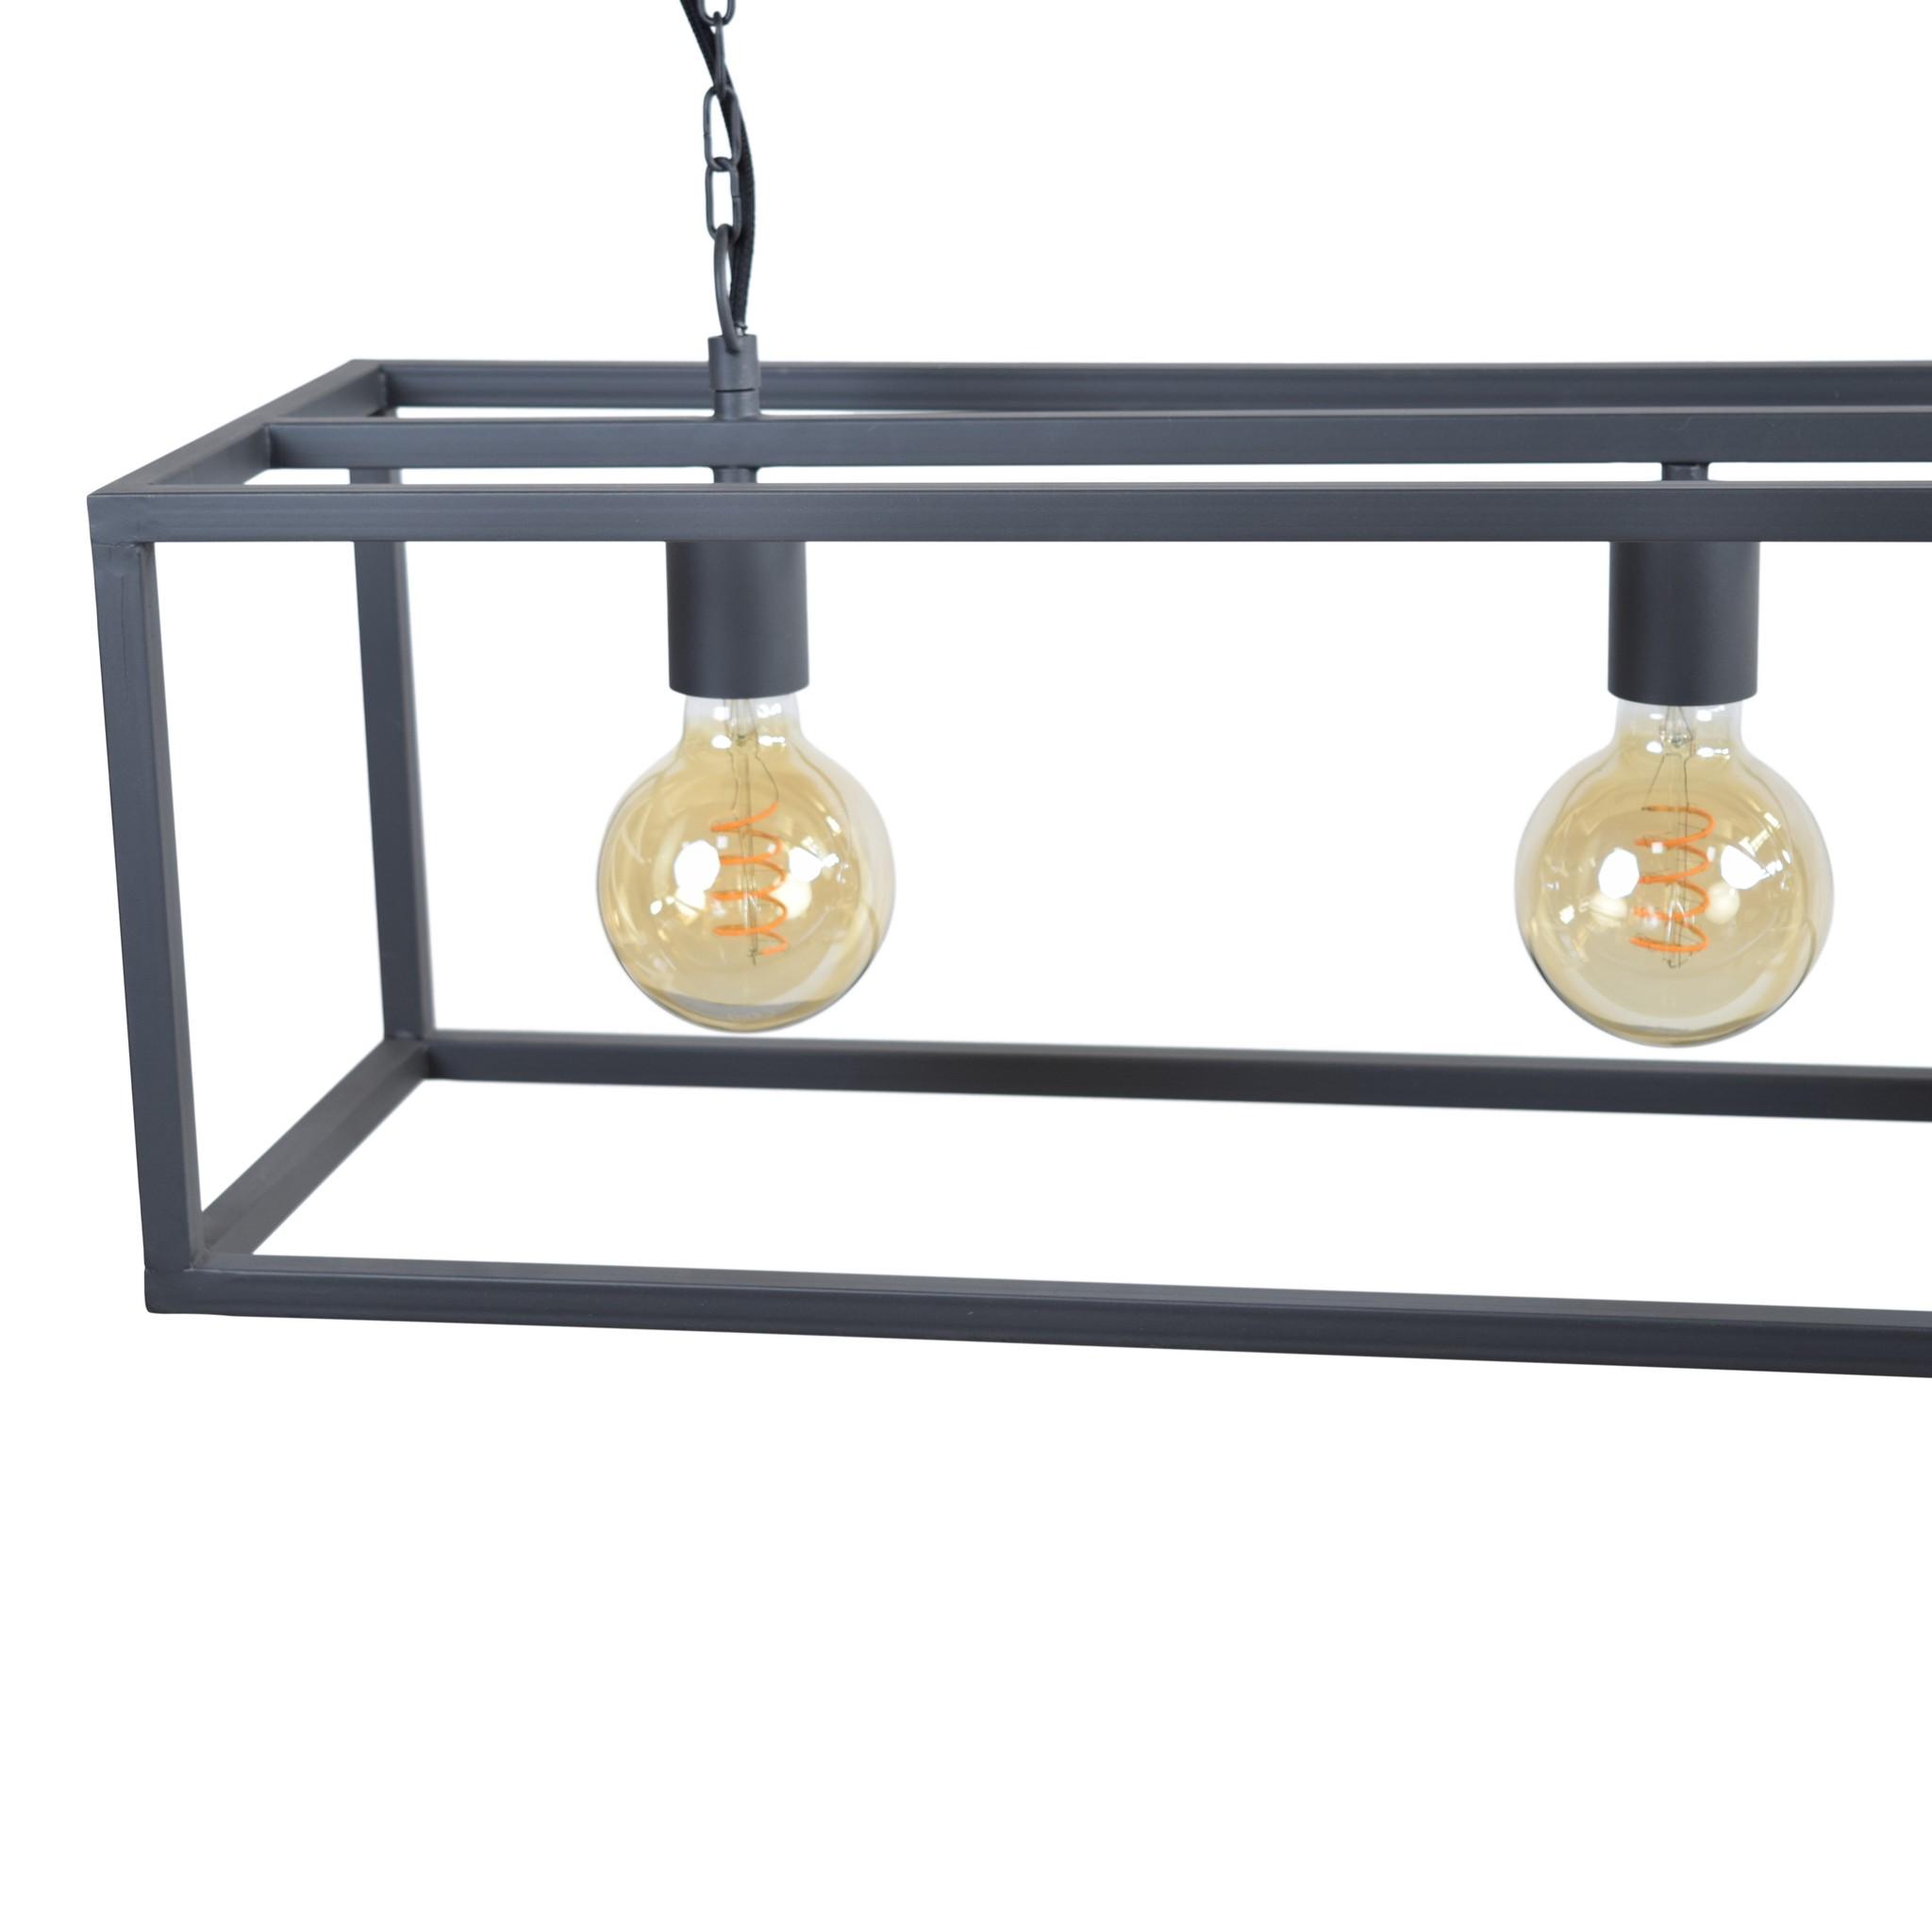 Urban Interiors Urban Interiors Hanglamp Frame 4-lichts 120cm Zwart